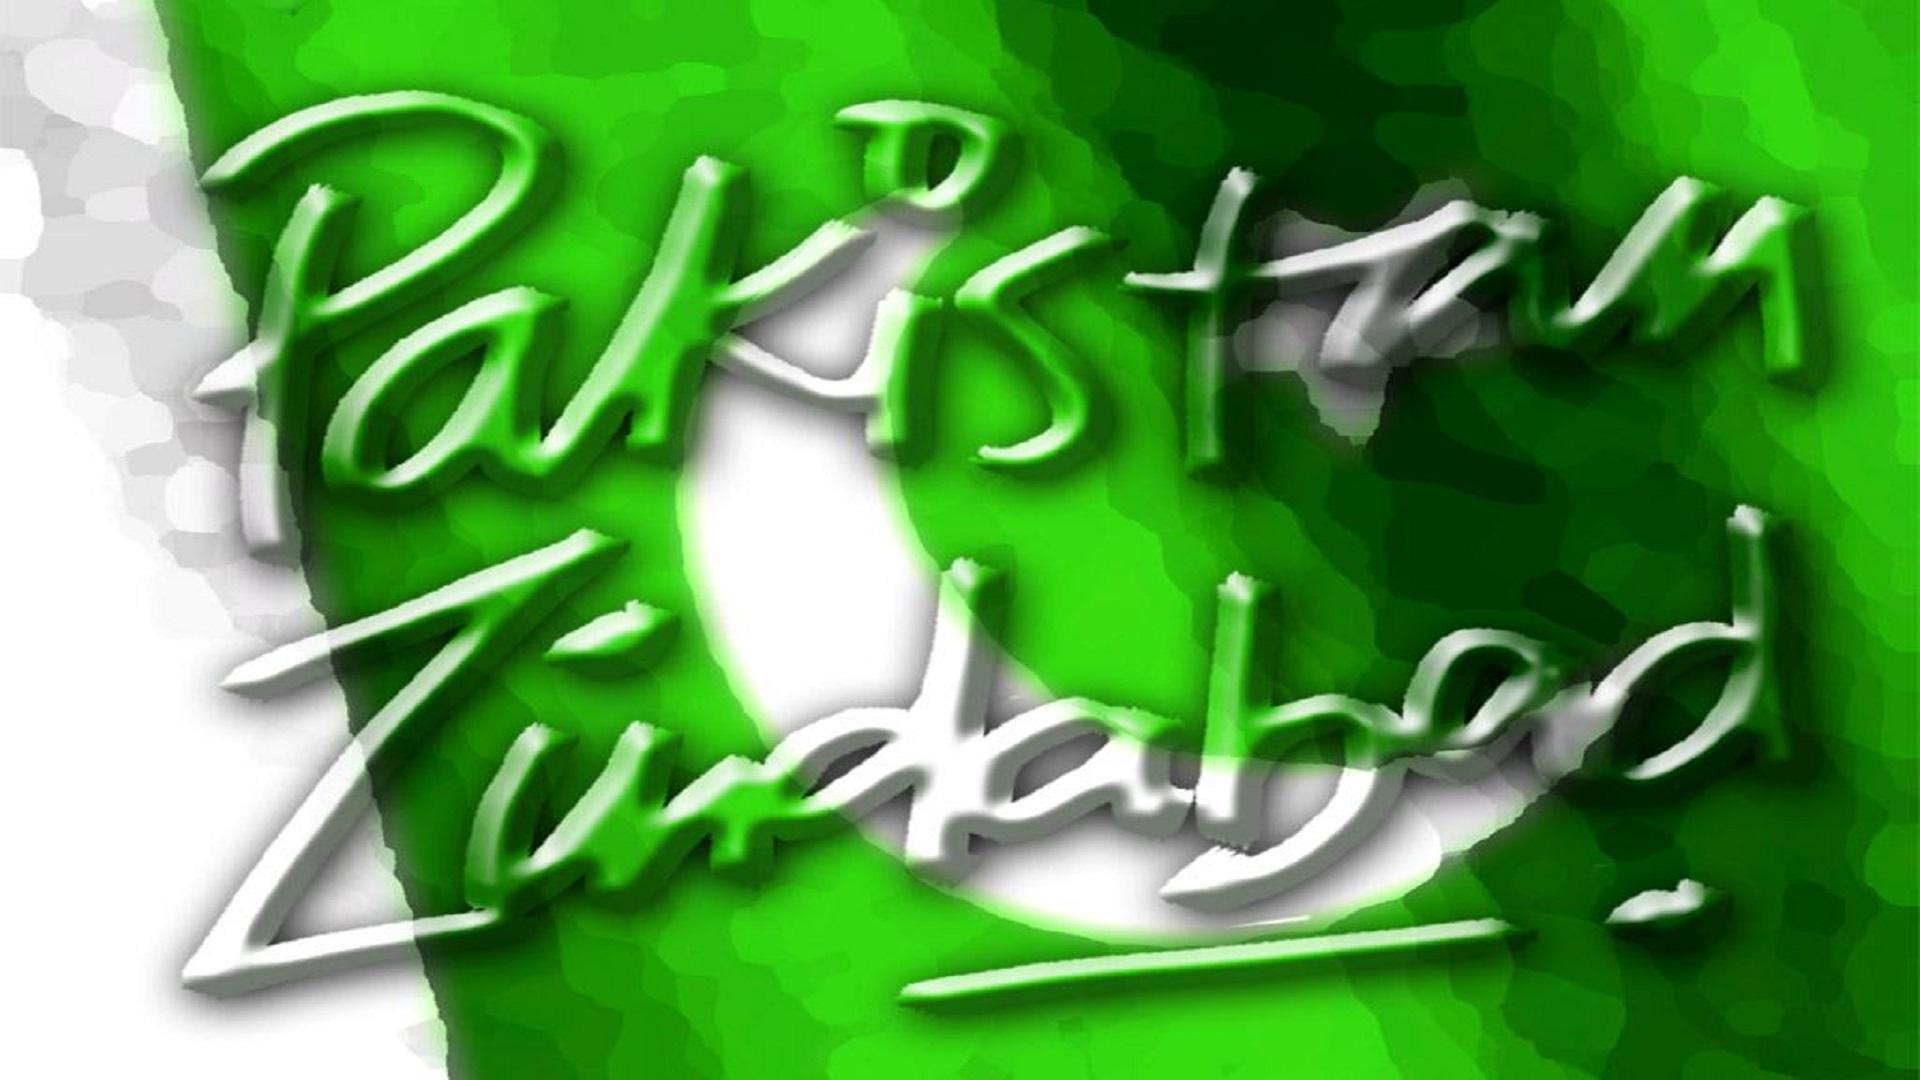 pakistani-flag-back-wallpapers-free-hd